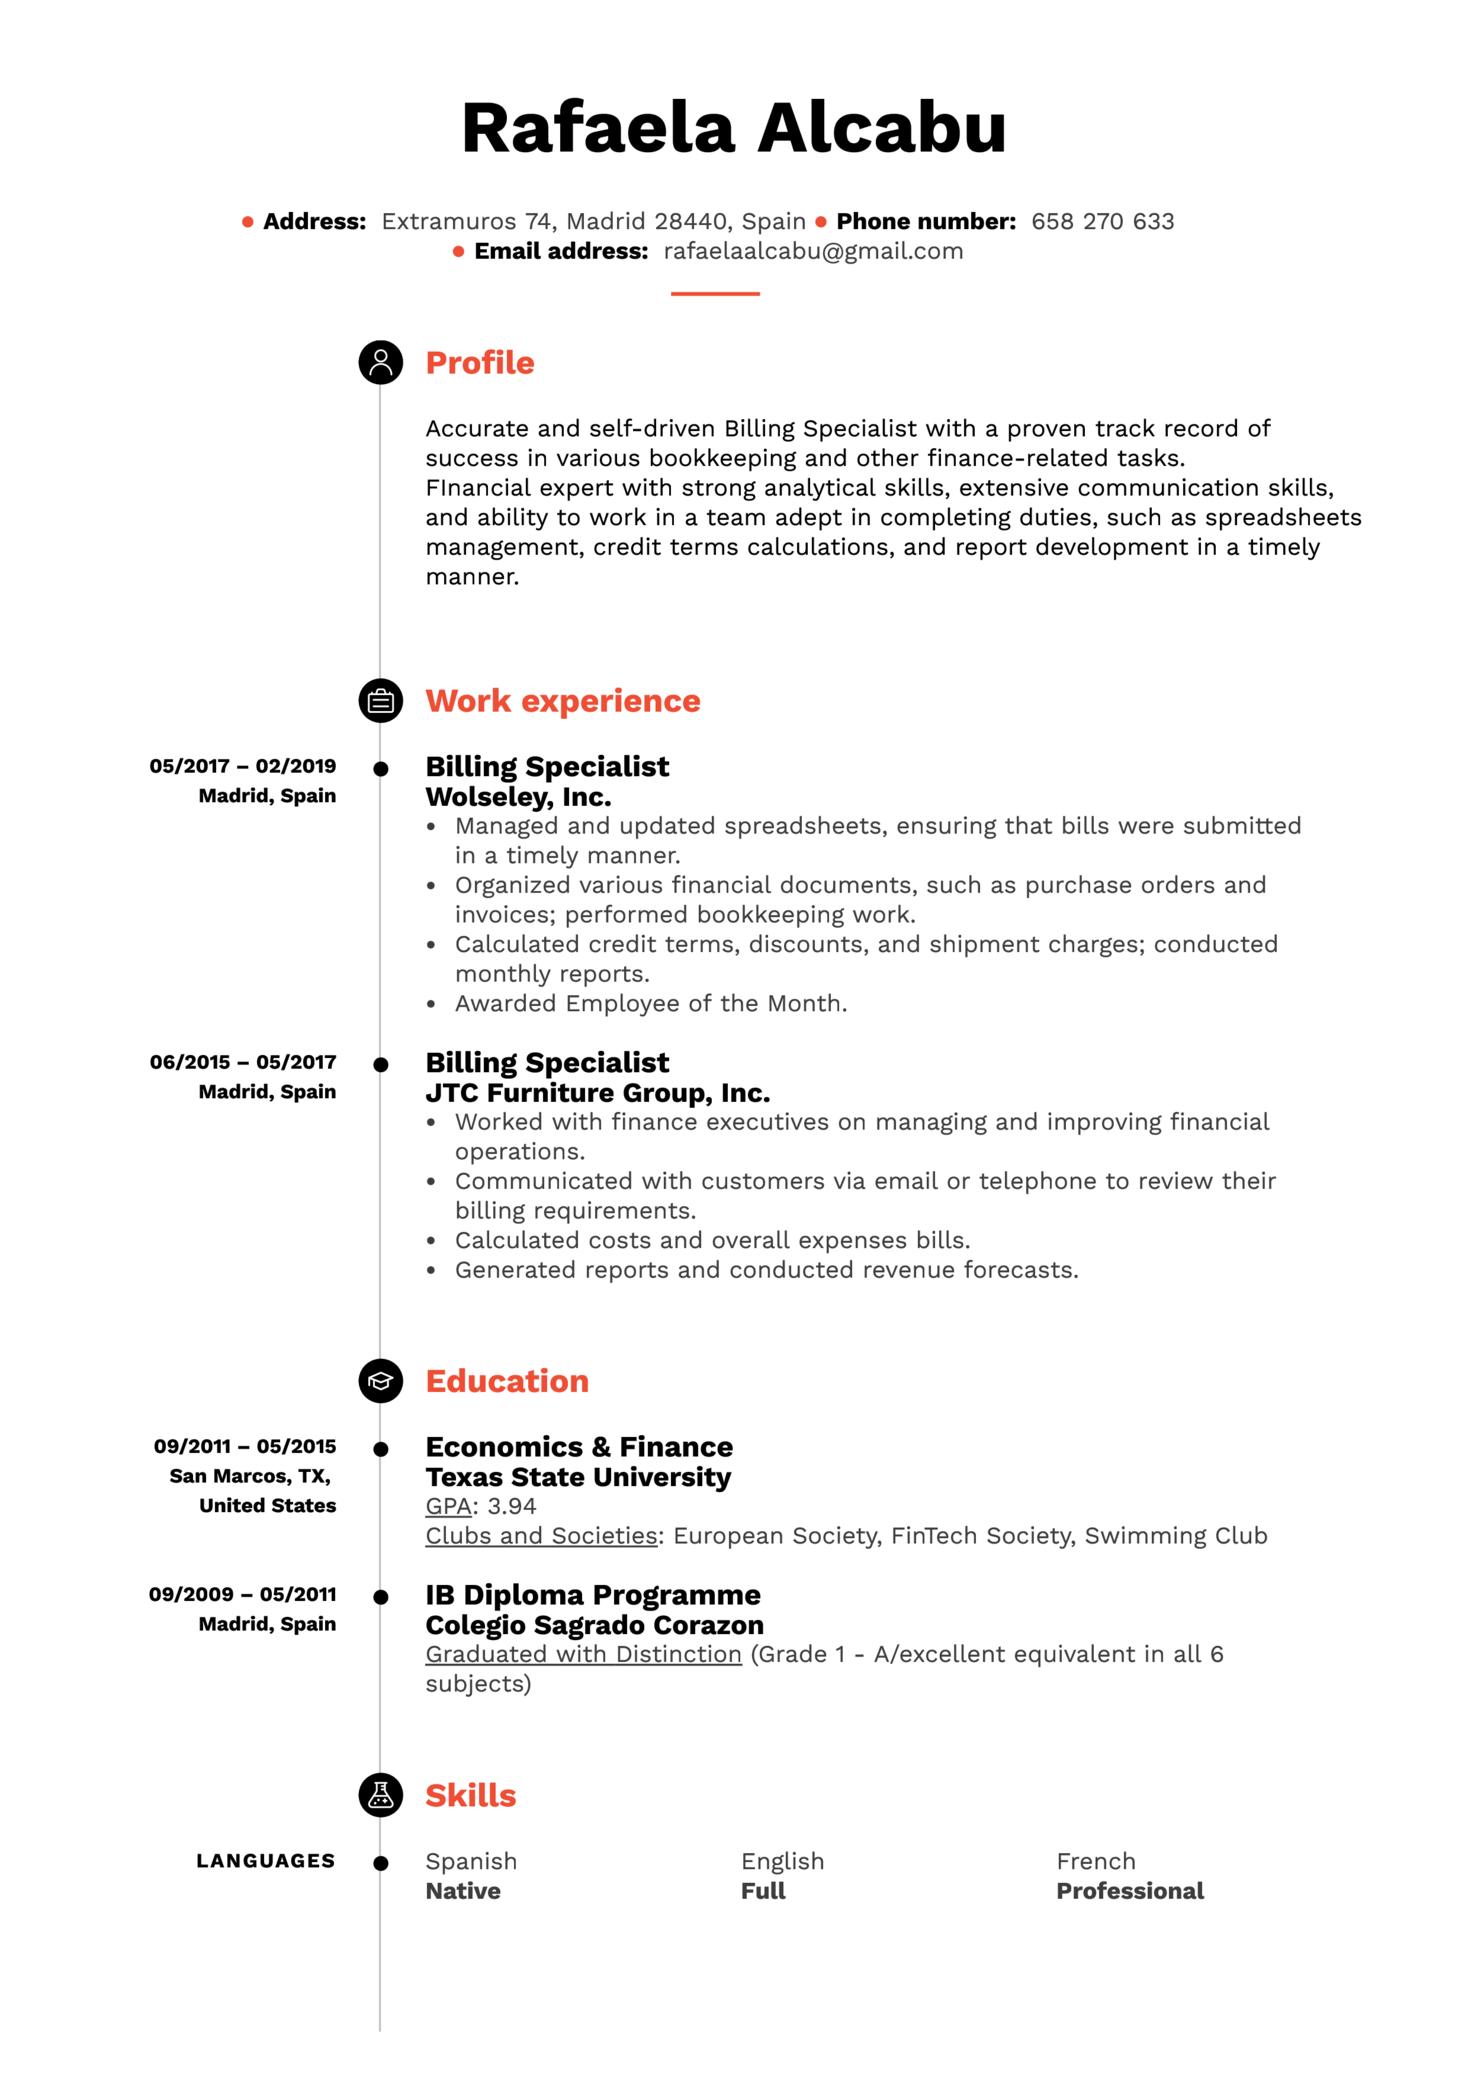 Billing Specialist Resume Example (parte 1)